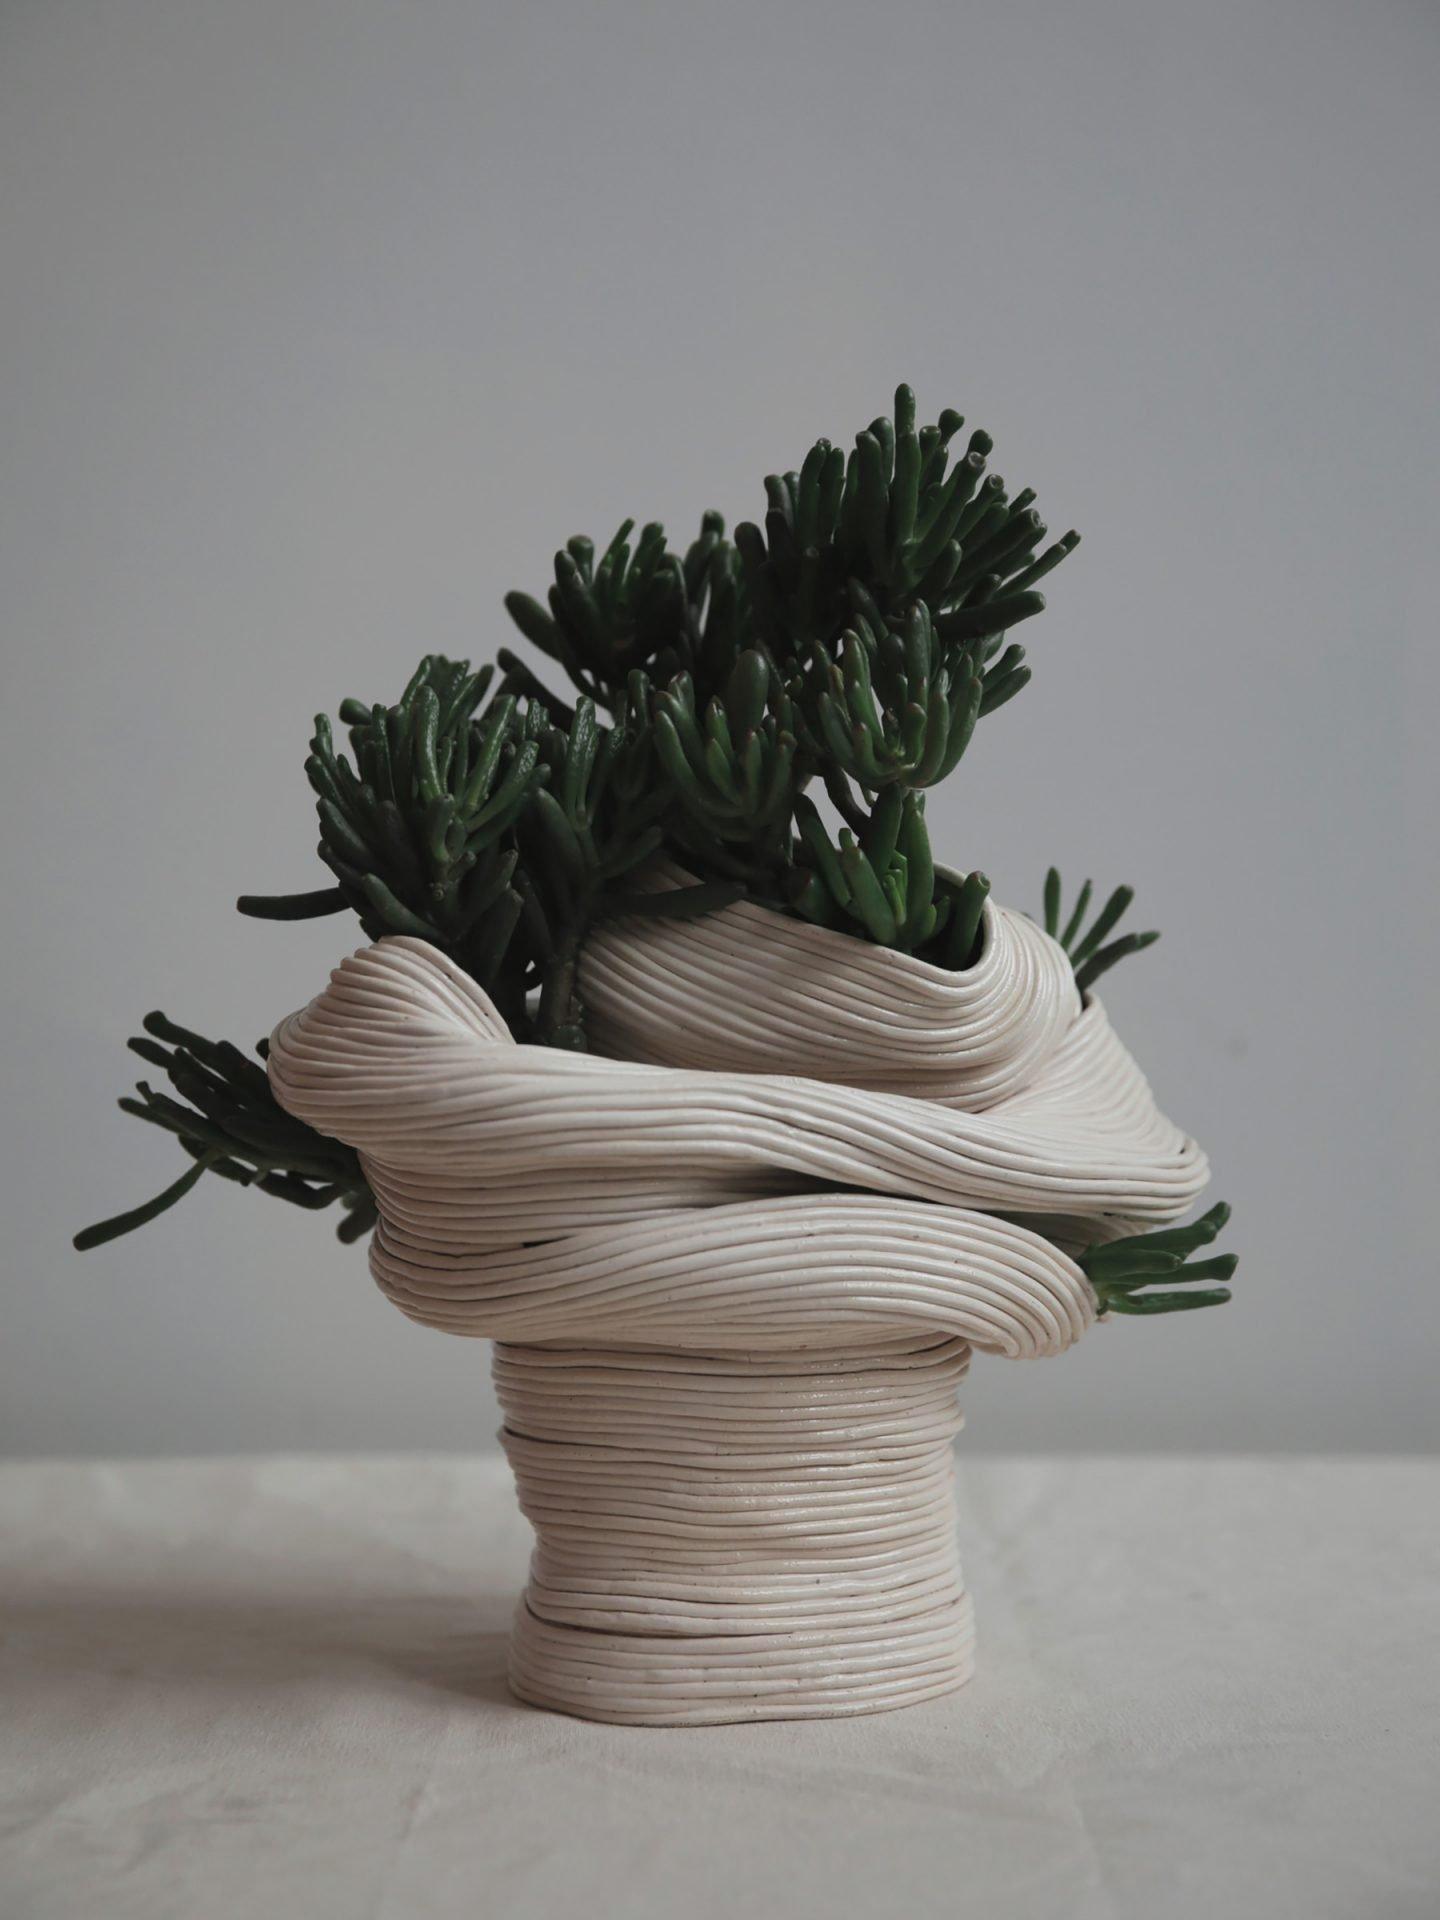 iGNANT-Design-Zhu-Ohmu-Plantsukuroi-01